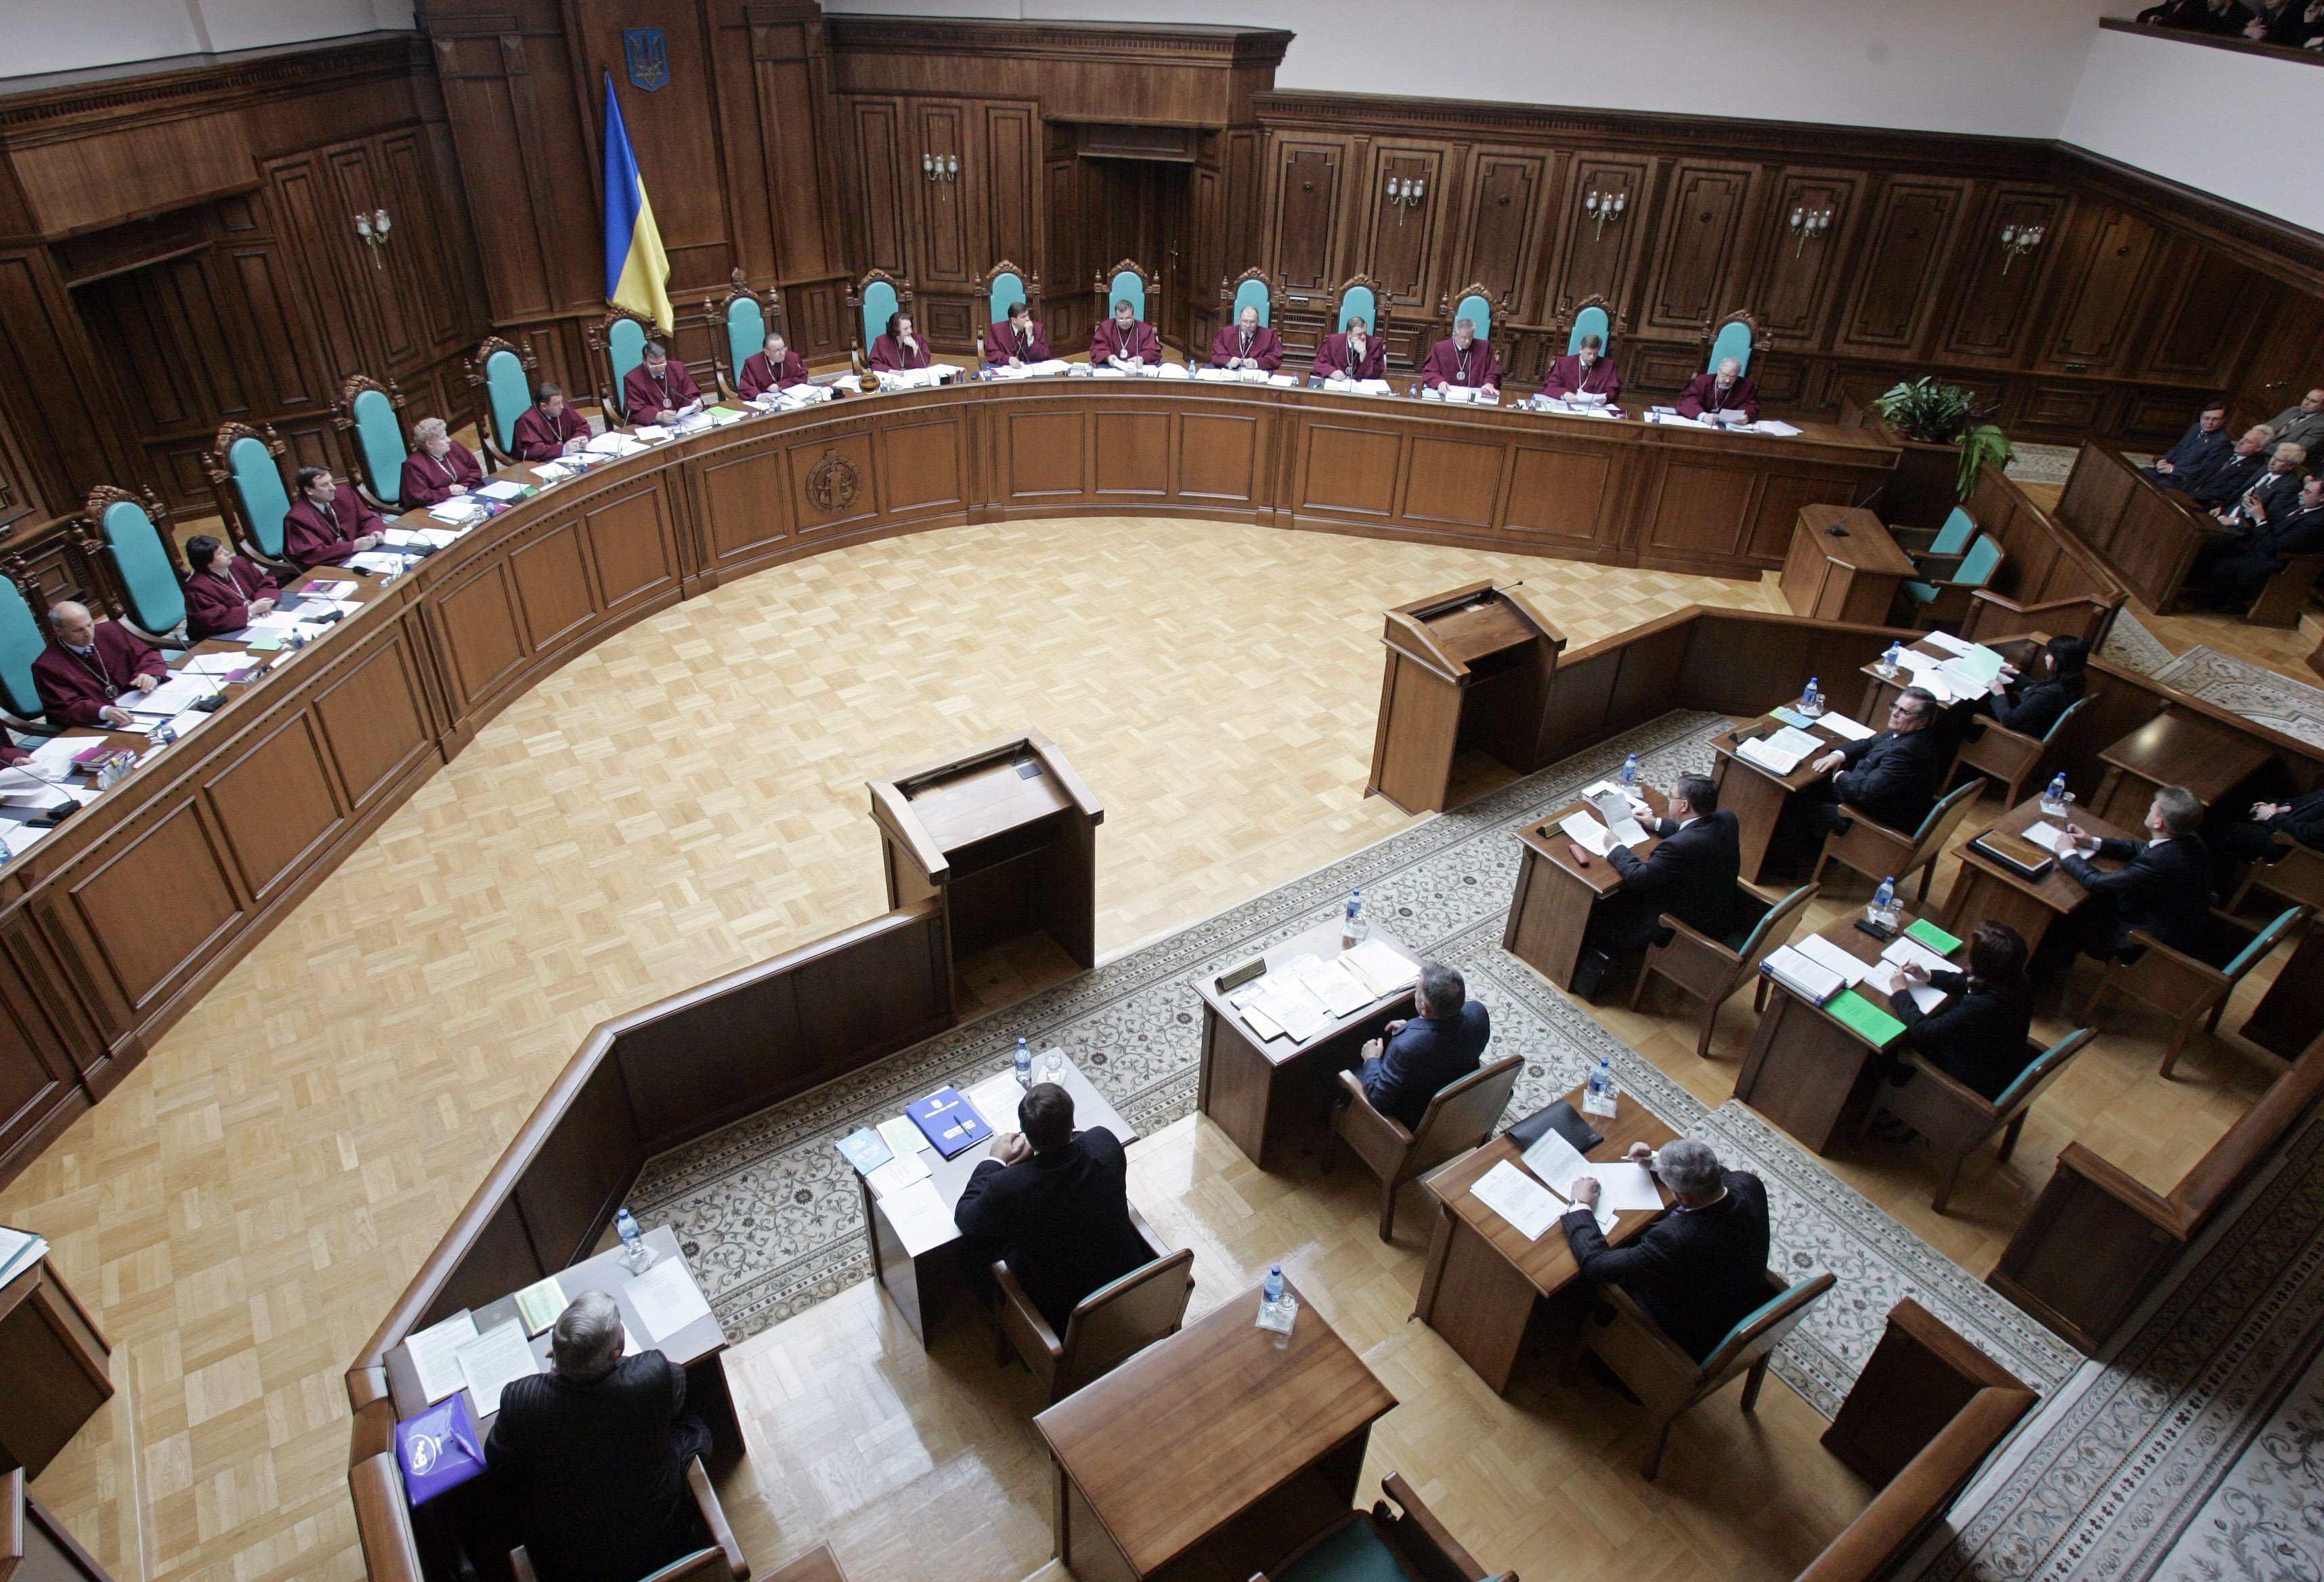 Ukraine's constitutional court in Kiev opens hearings to determine whether President Viktor Yushchenko's decree dissolving parliament was legal